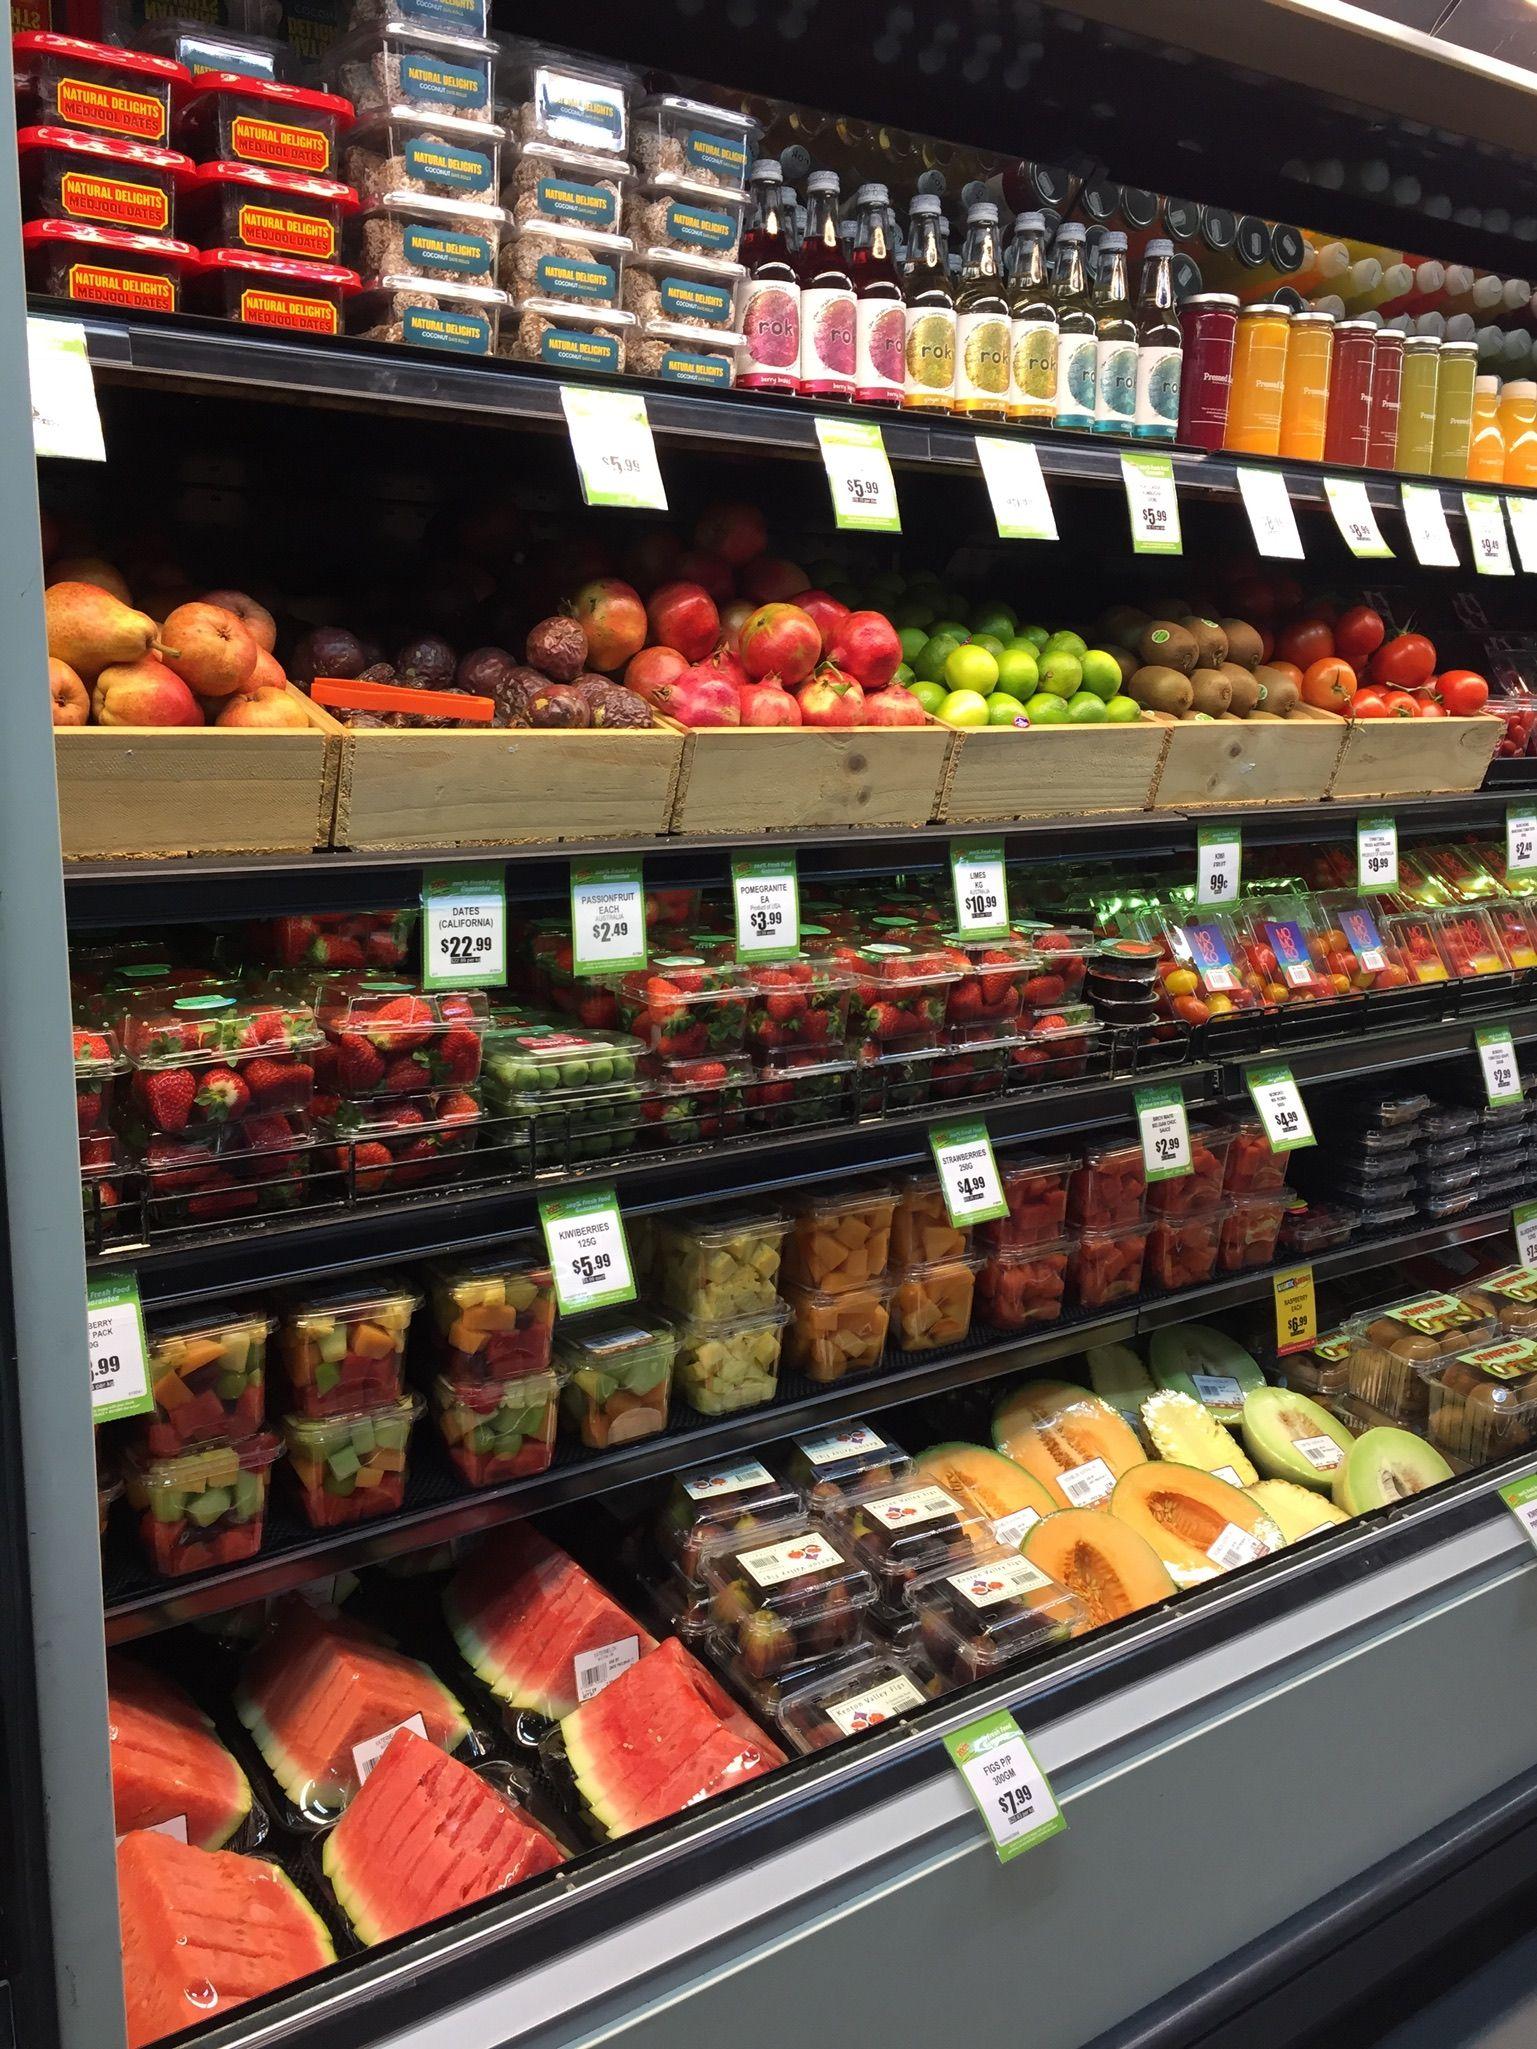 Pin De Cveti Em Fresh Produce Displays Loja De Fruta Frutas Fruteira